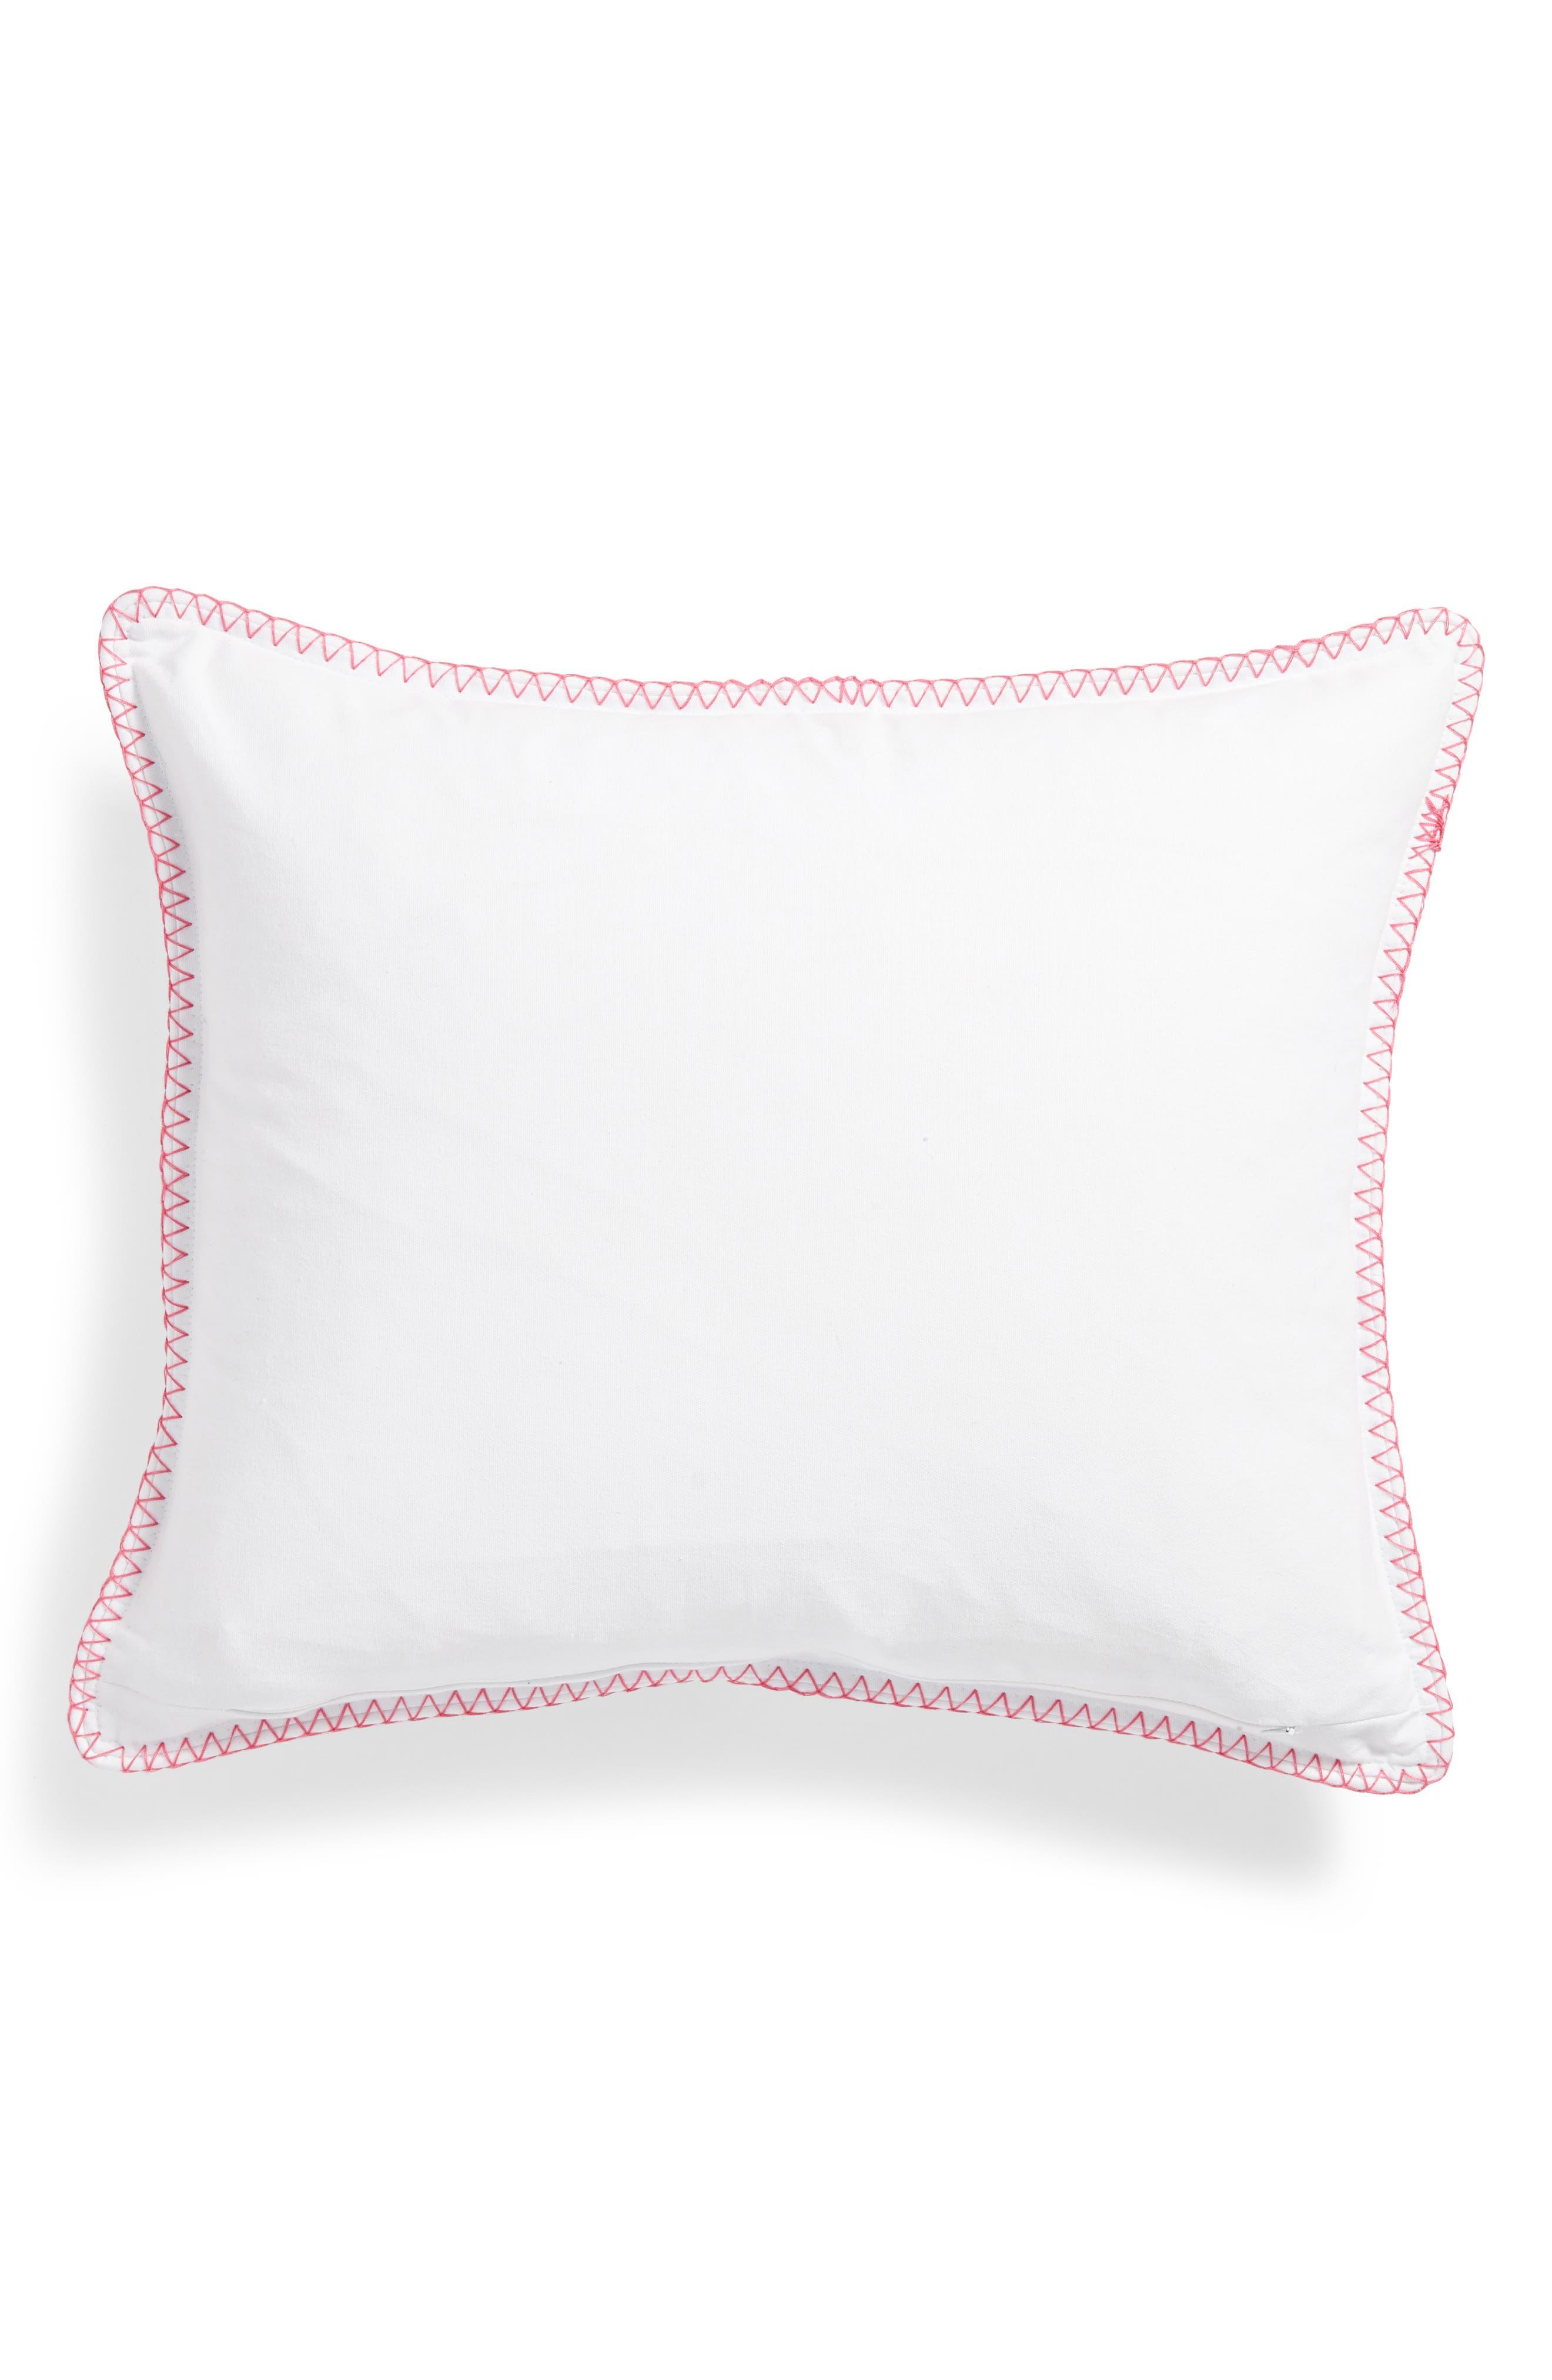 Smore & Smore Accent Pillow,                             Alternate thumbnail 2, color,                             100